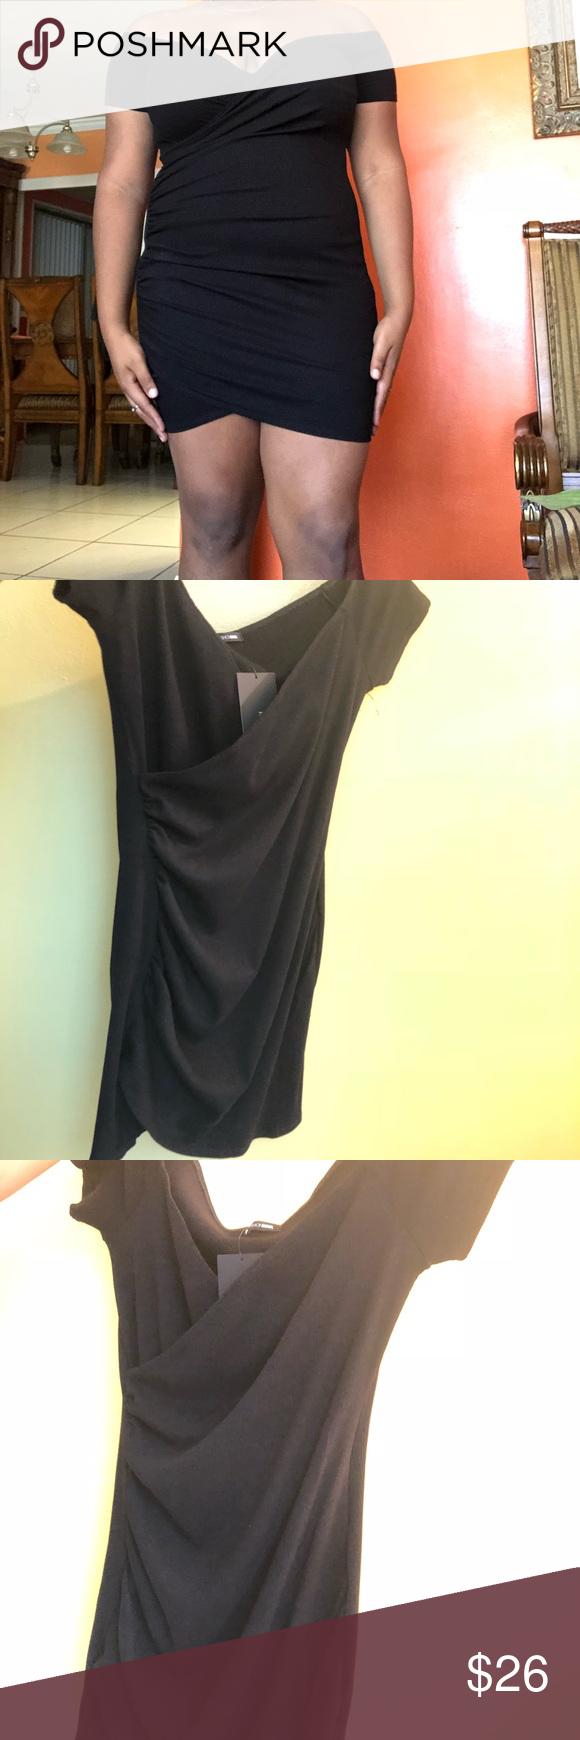 The night we met dress black fashion nova Tried on the dress 10242ff48